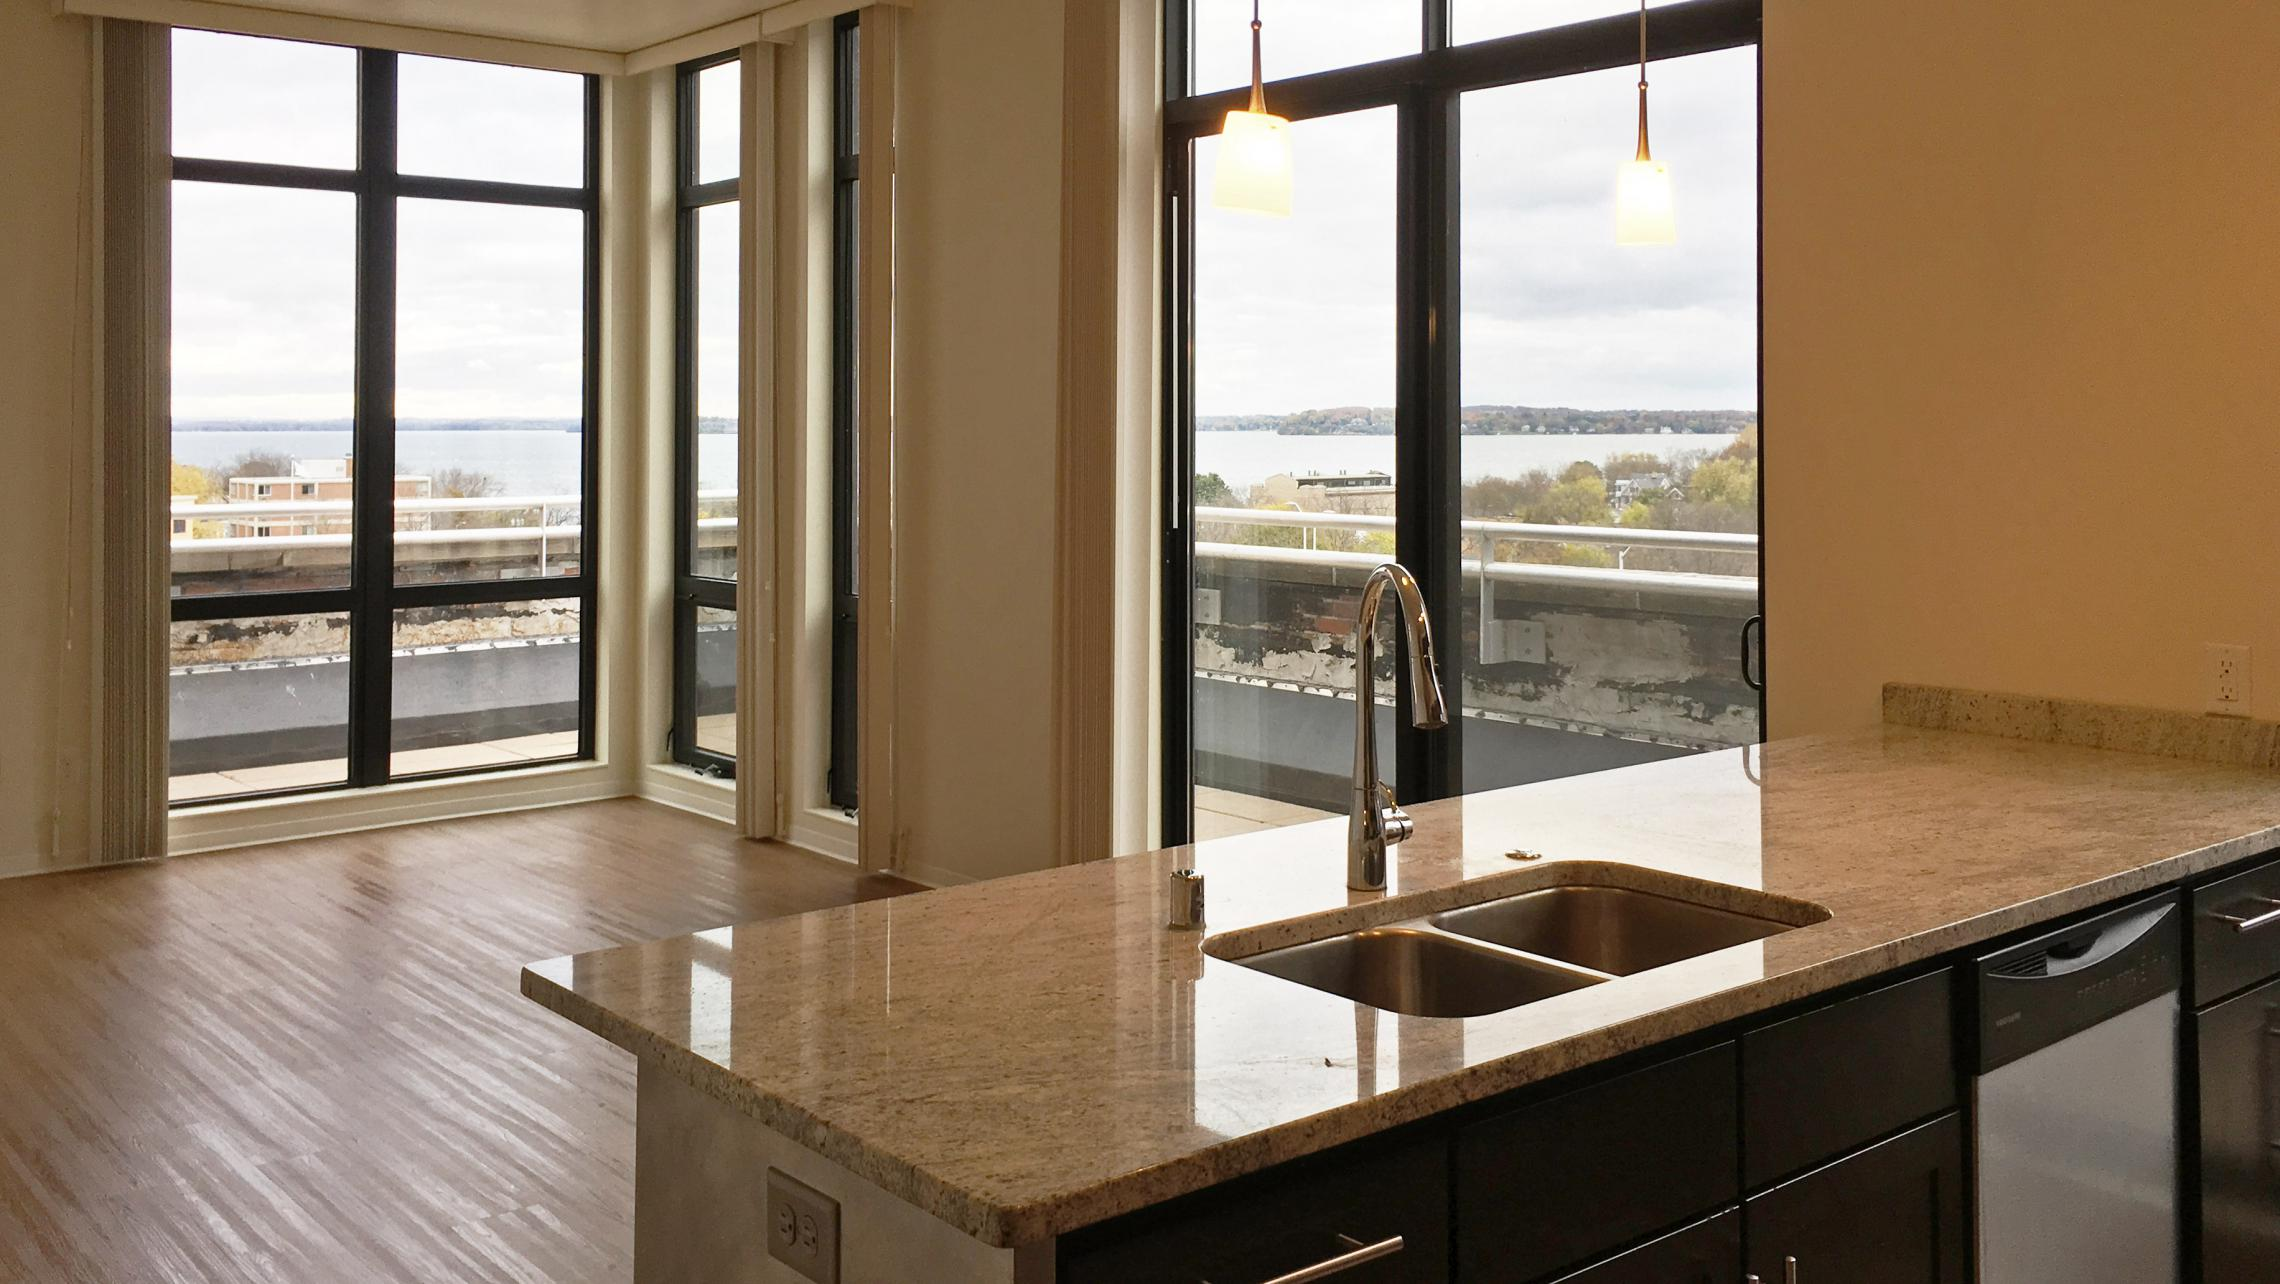 ULI Capitol Hill - Living Room with Lake Mendota View